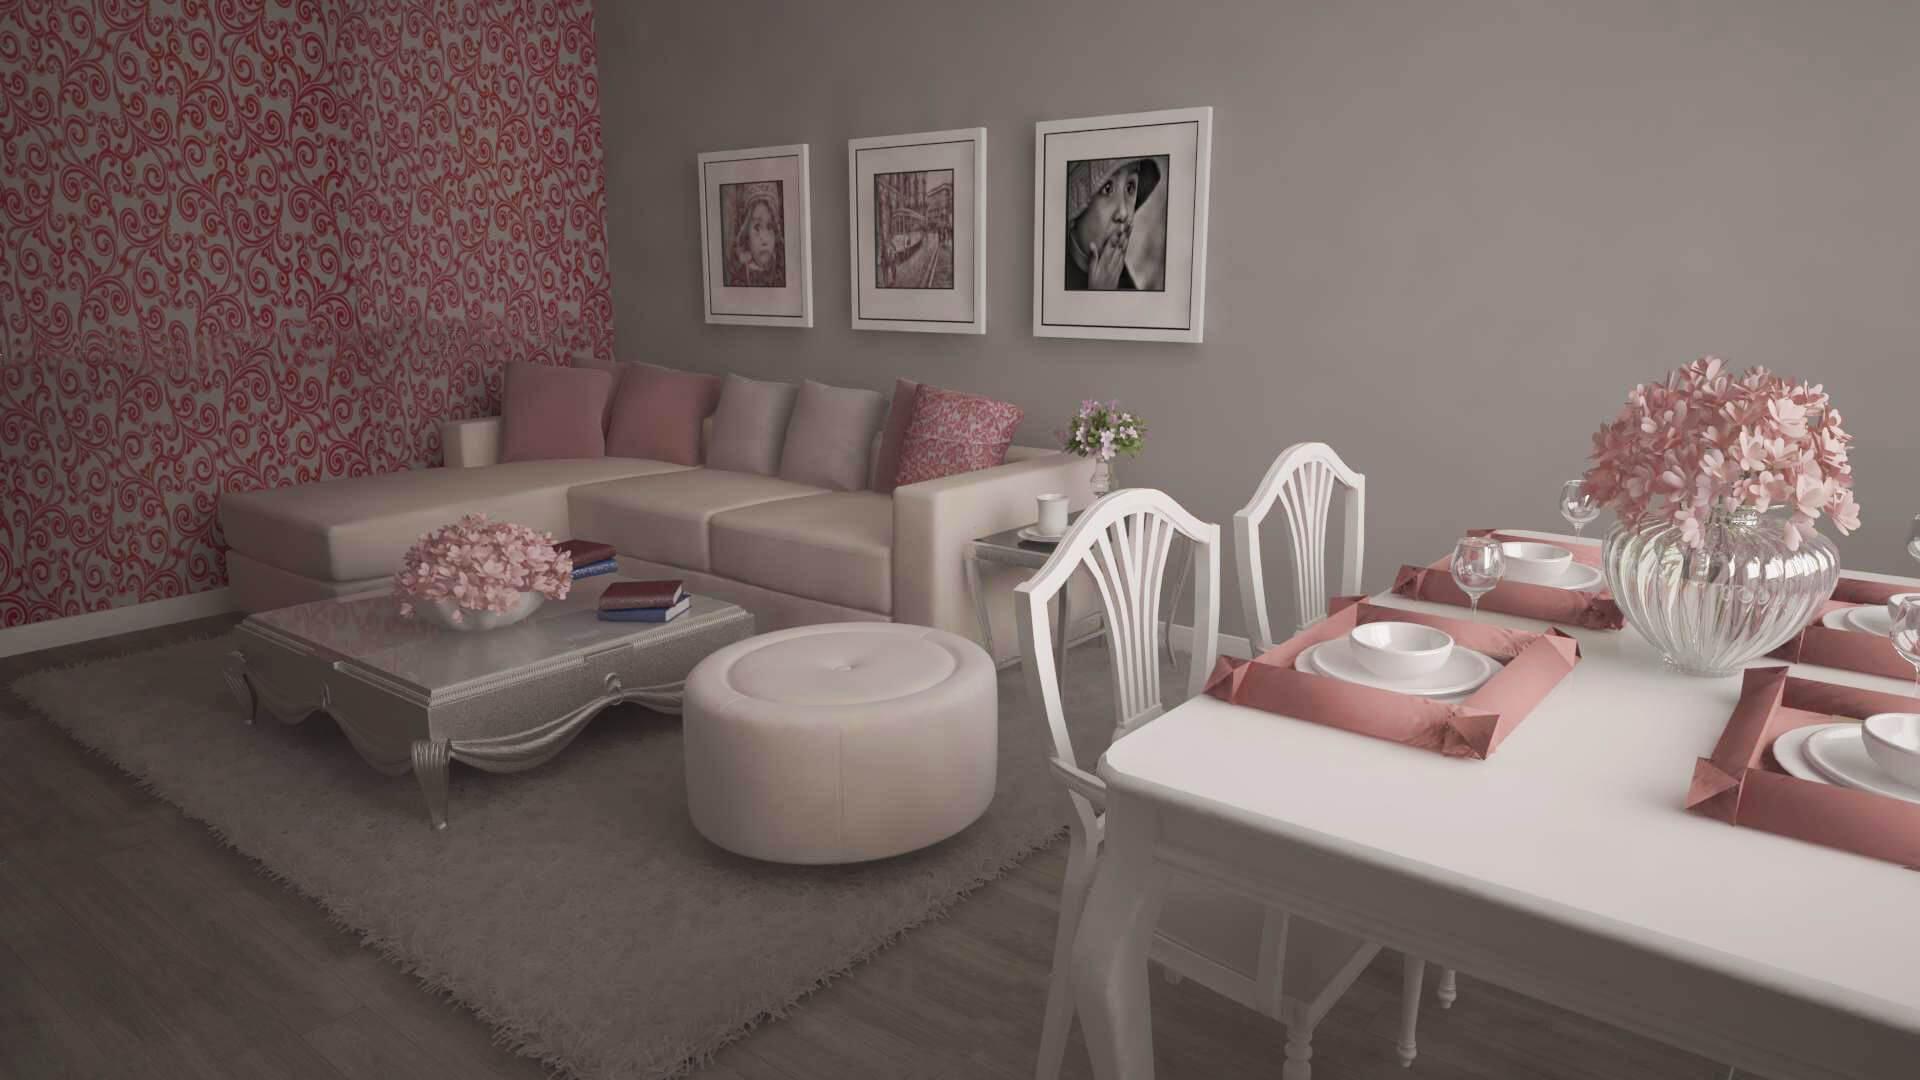 Decorador de interiores paloma angulo with decorador de for Decorador de interiores virtual